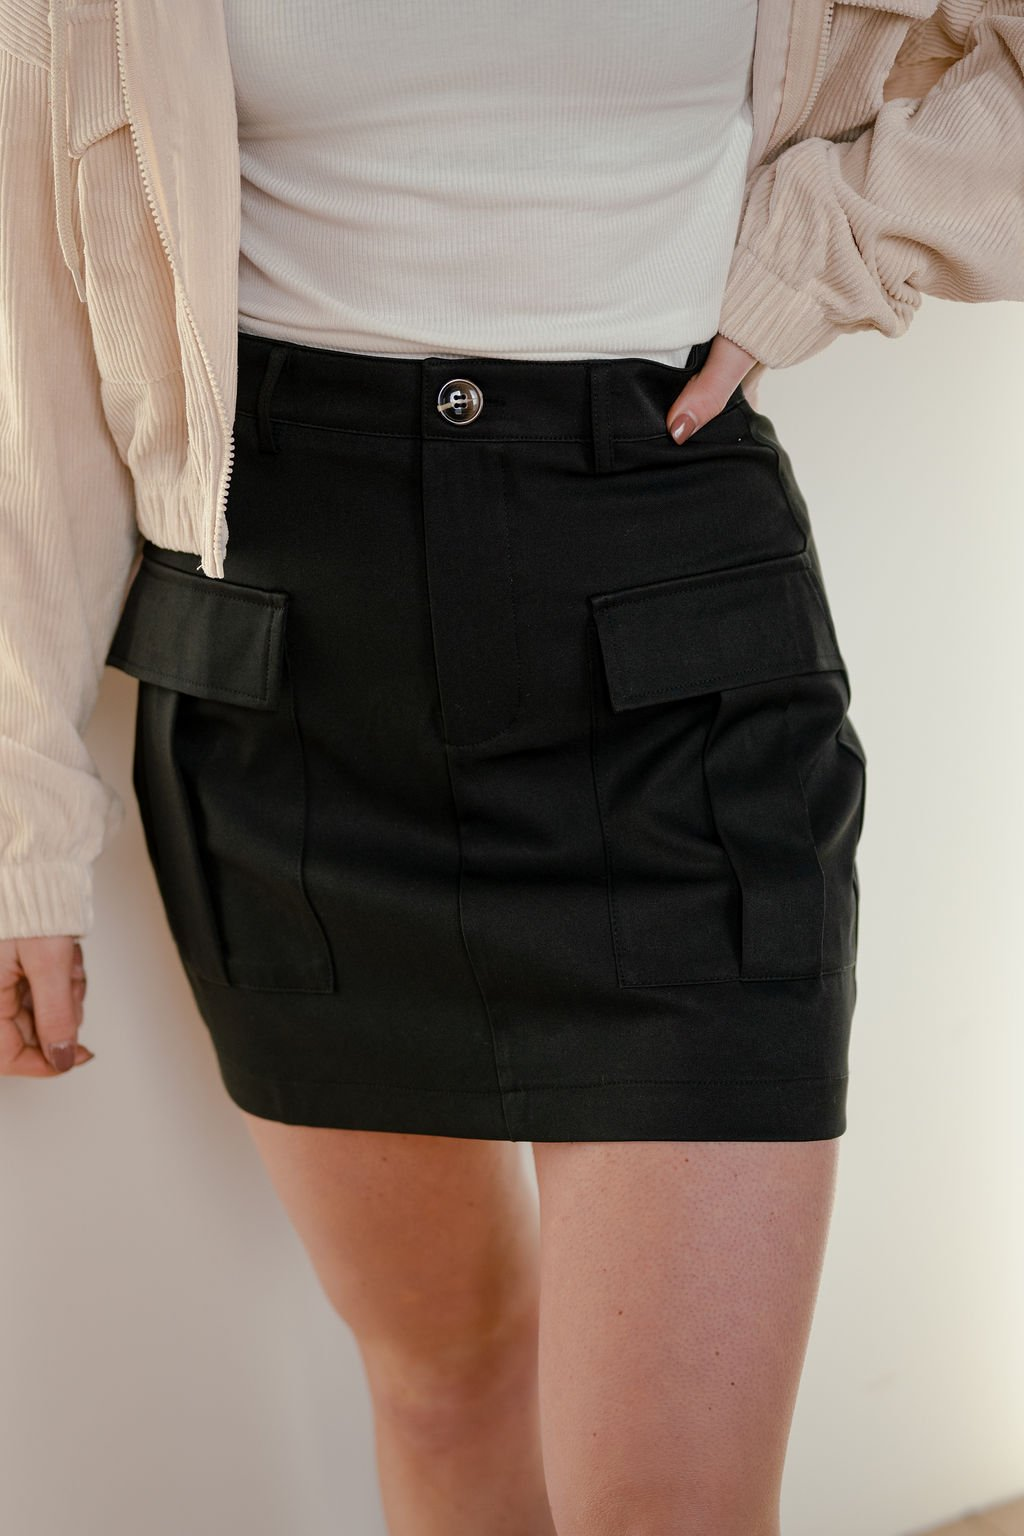 Idem Ditto Black Mini Skirt